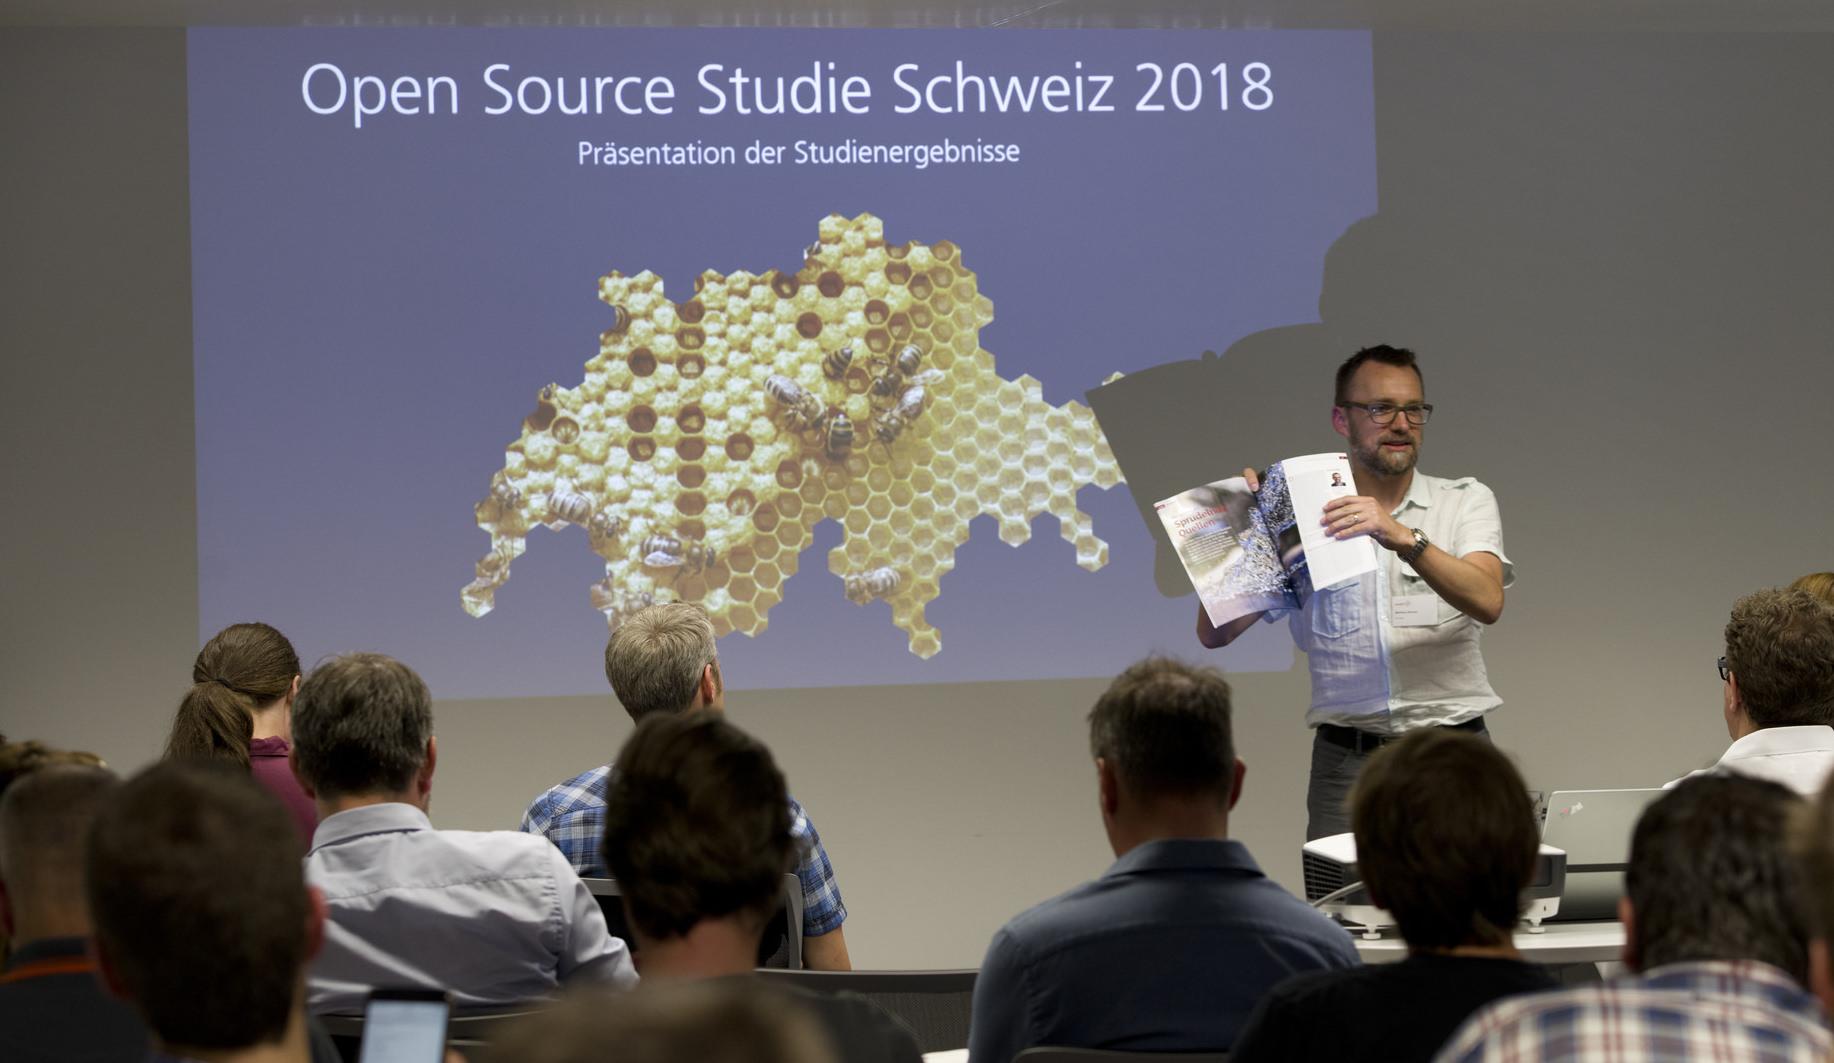 Praesentation der OSS Studie 2018